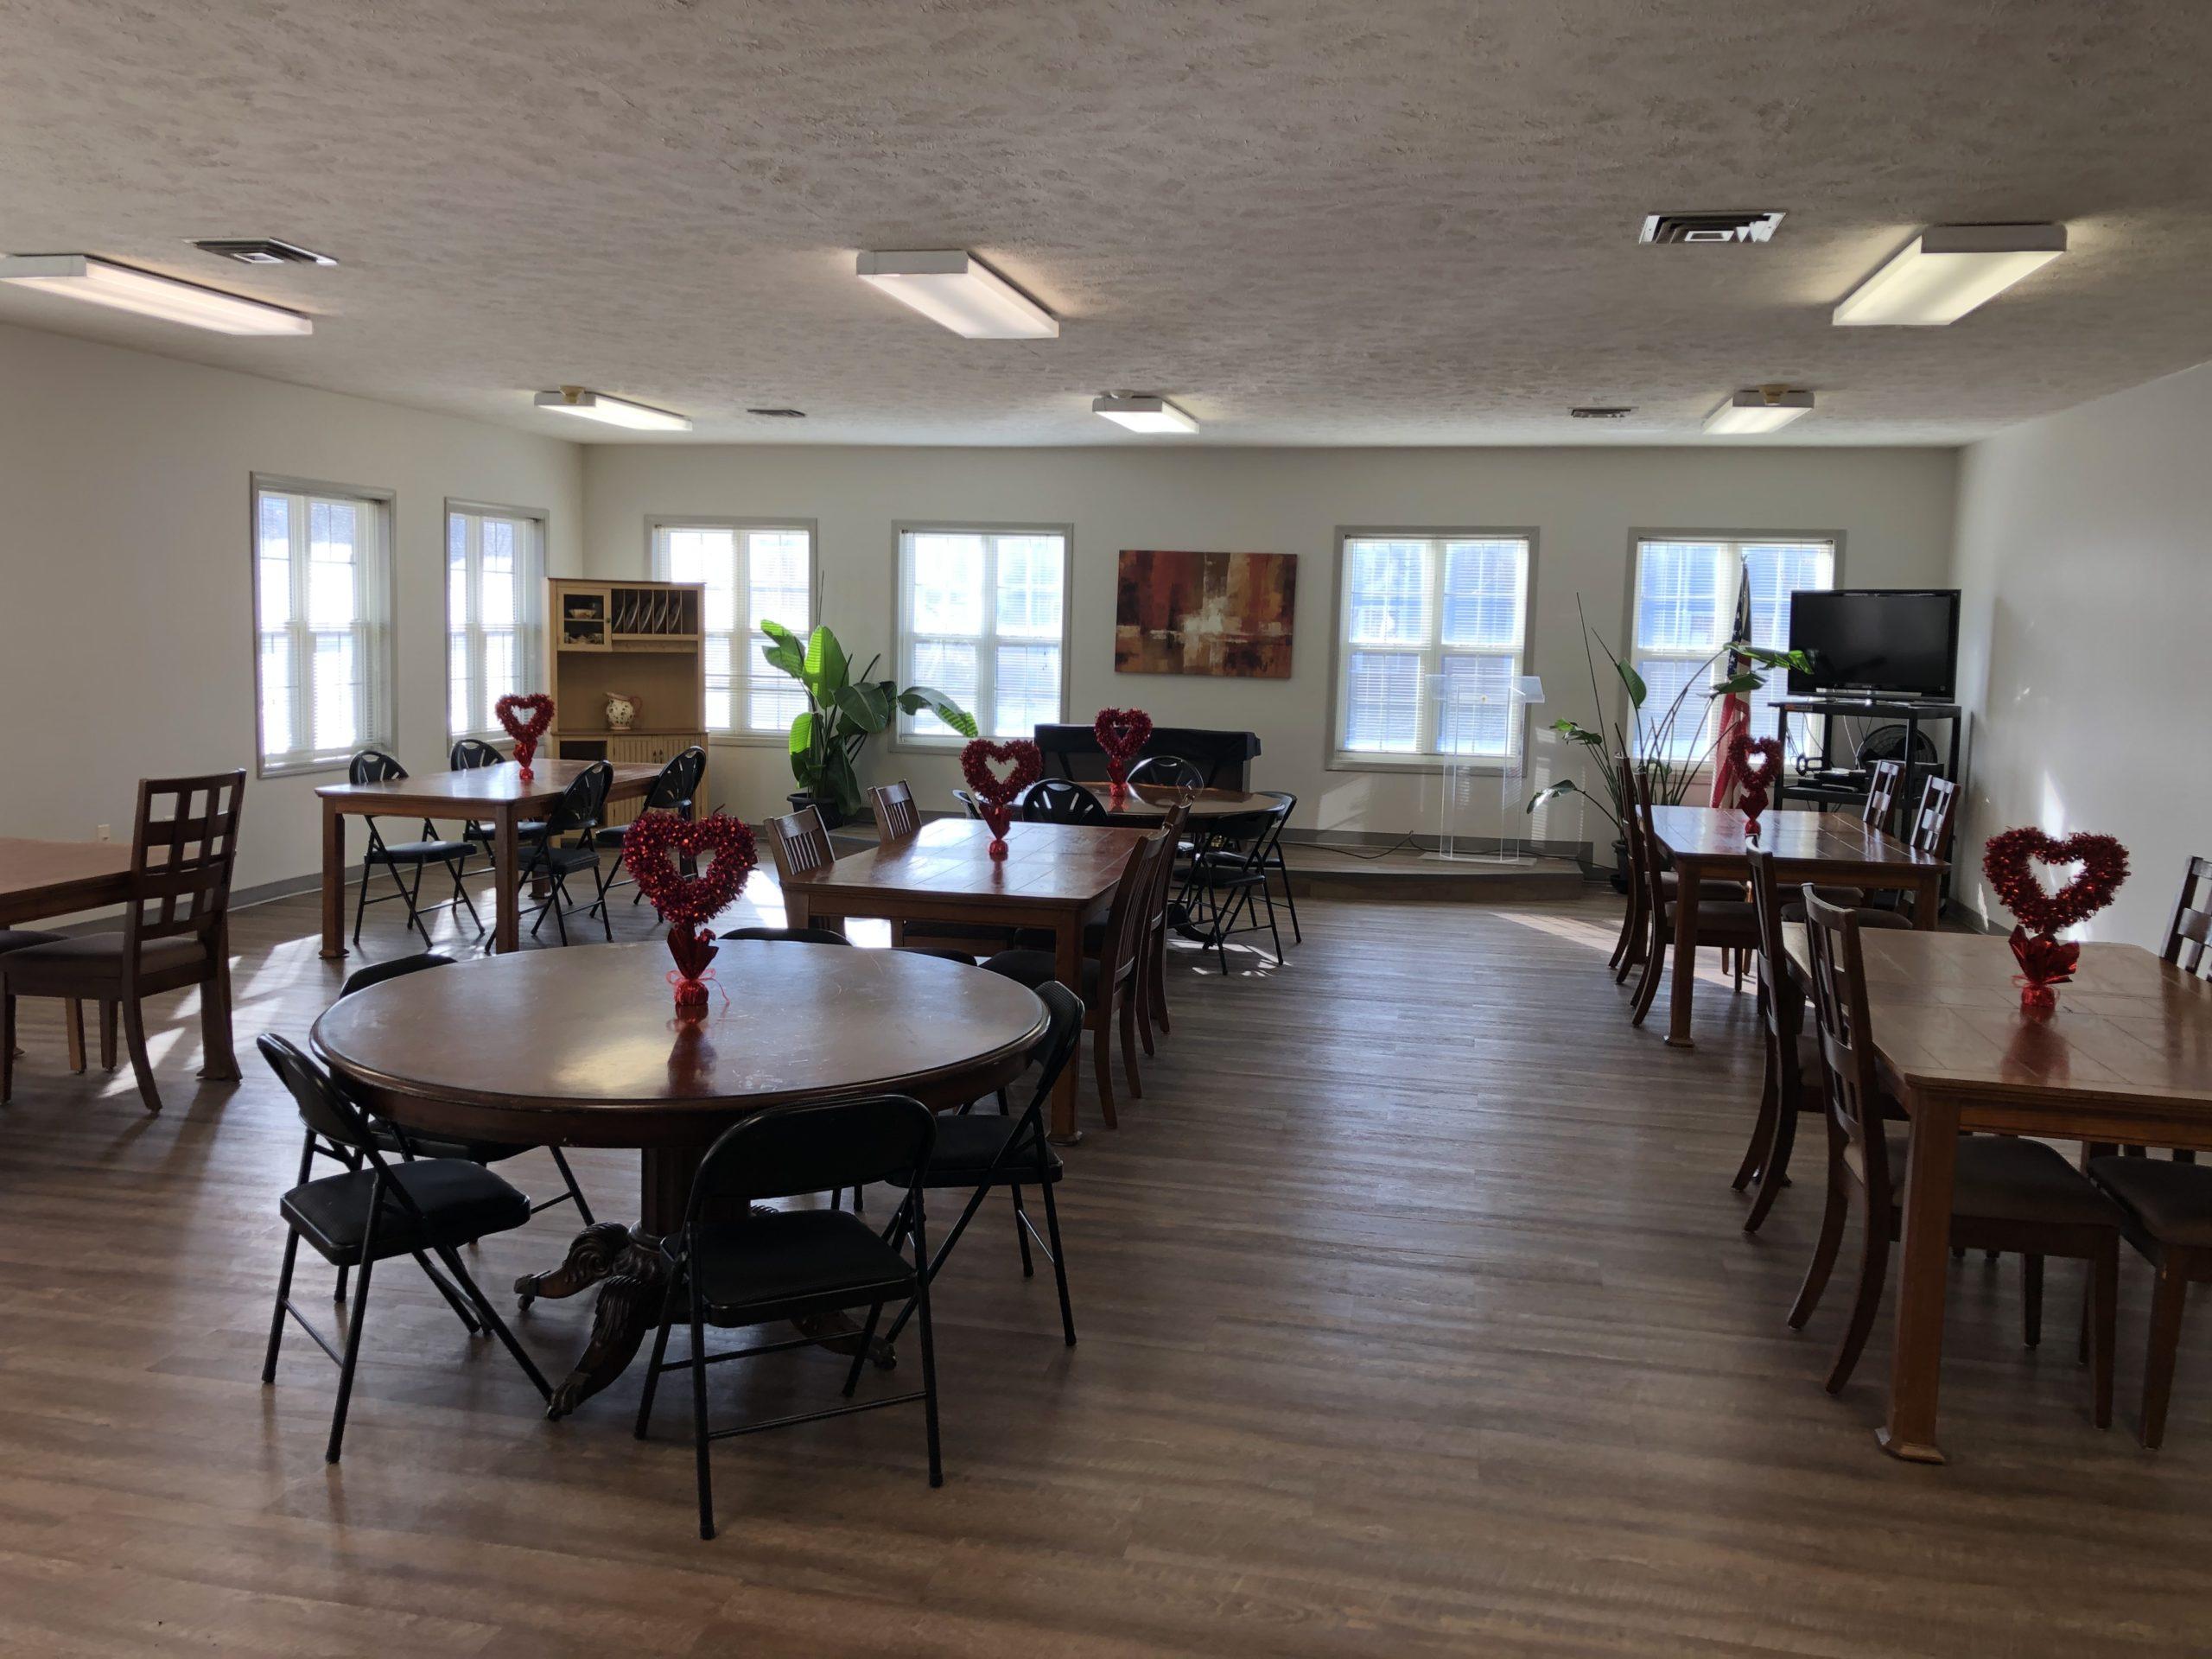 Tregaron Senior Residence Bellevue Nebraska community room